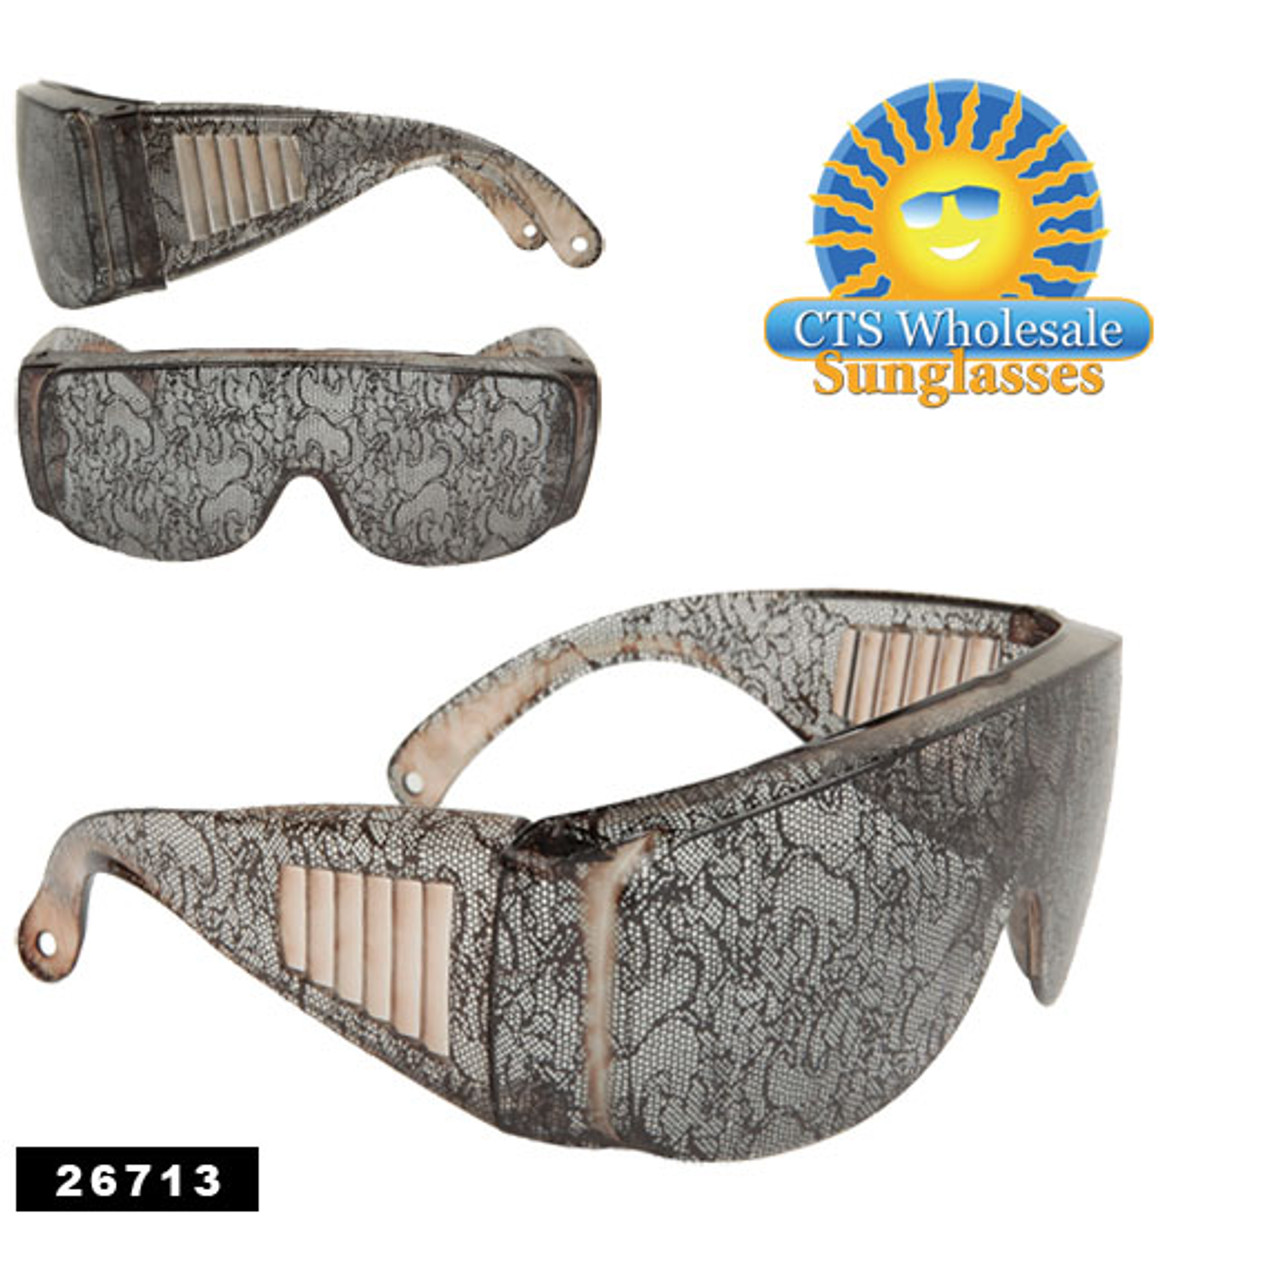 Lady Gaga Inspired Sunglasses